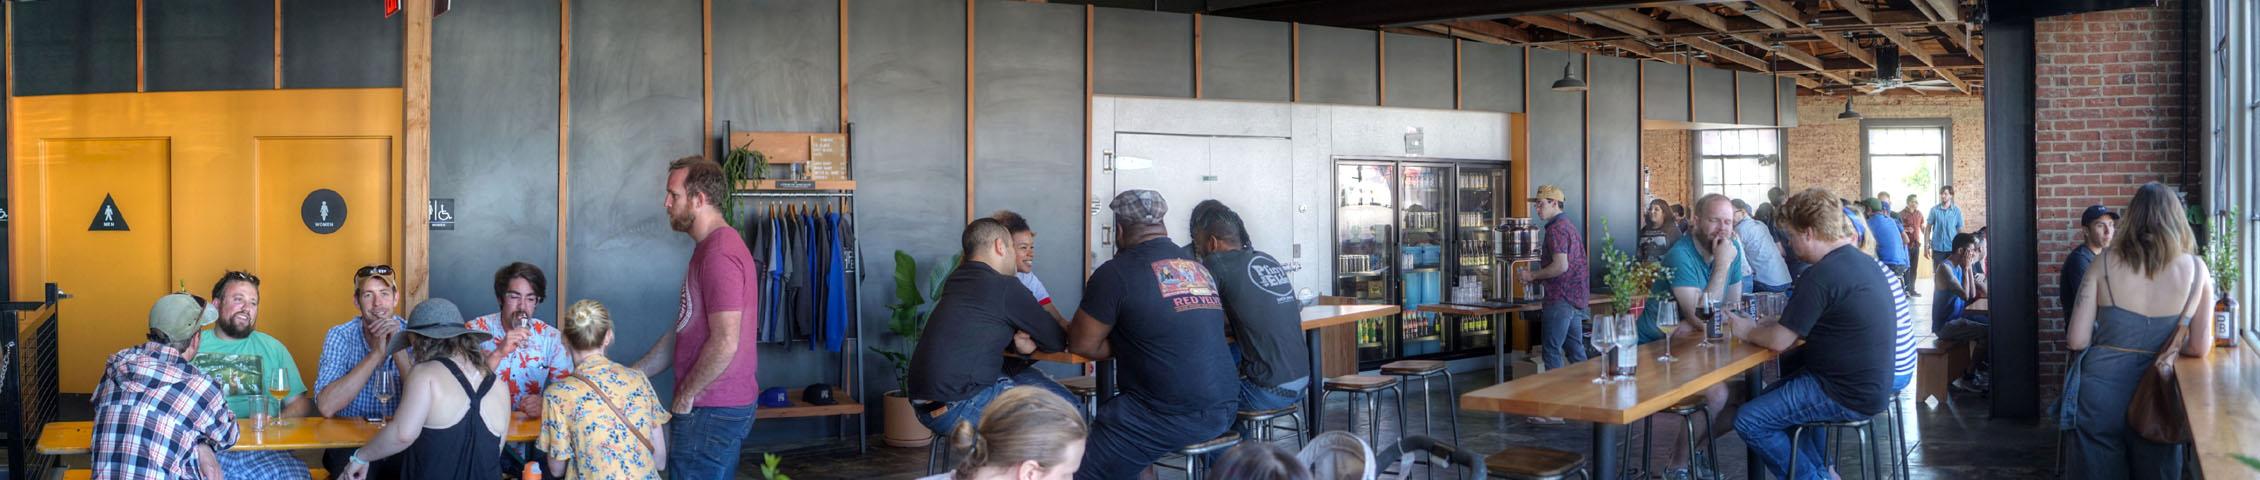 Highland Park Brewery - Chinatown Interior: Back